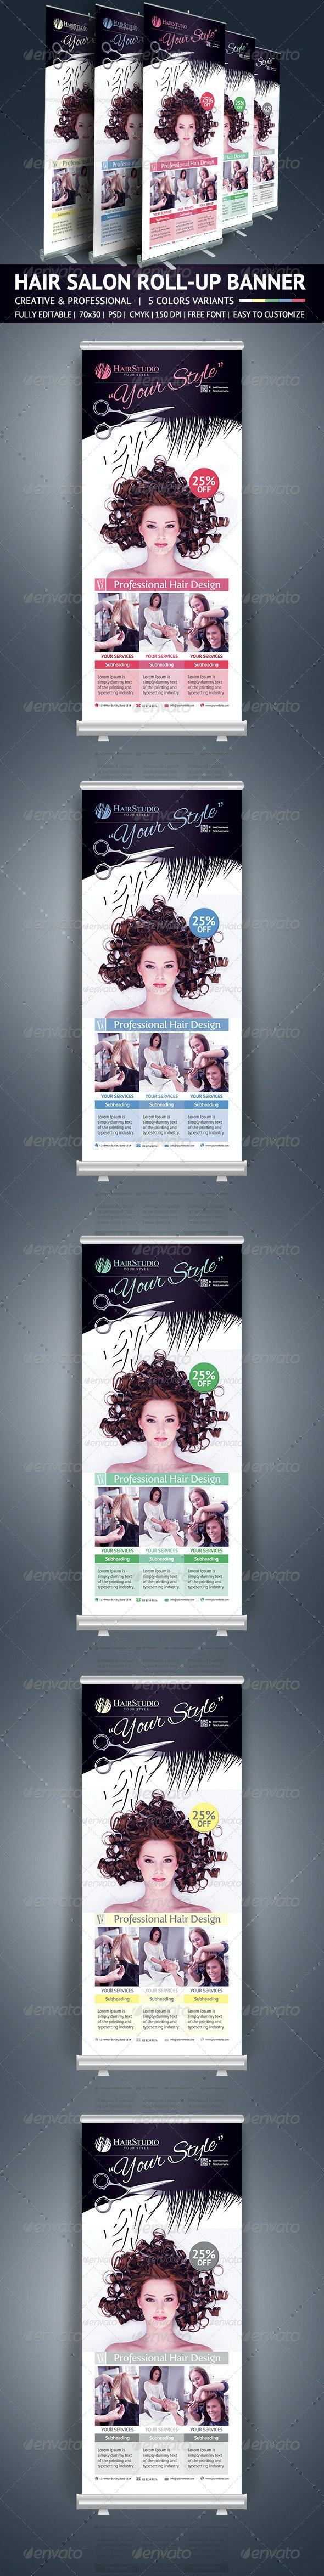 Hair Salon Roll Up Banner  - Signage Print Templates